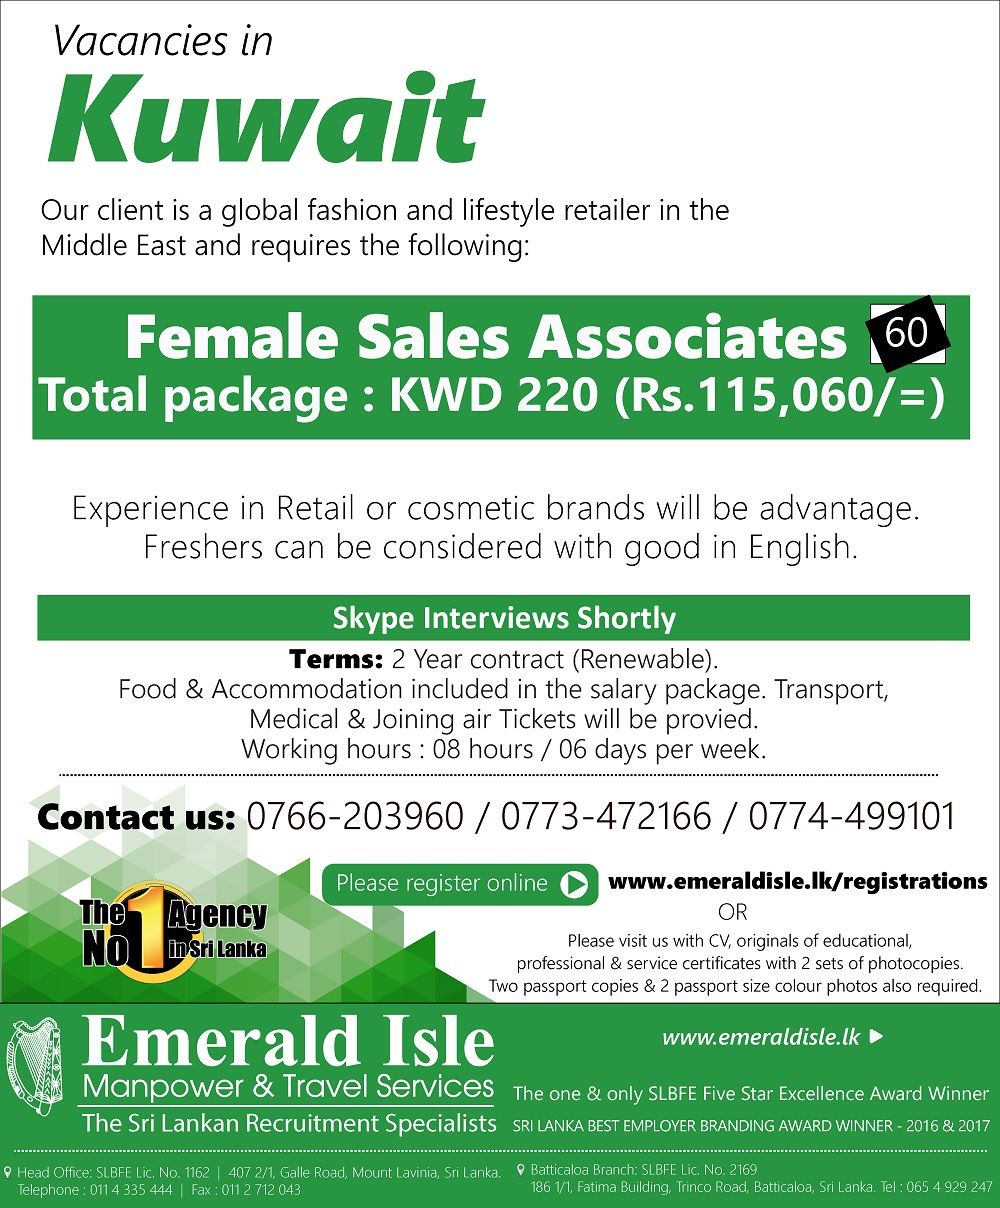 Emerald Isle Recruitment Specialist | Foreign Vacancies